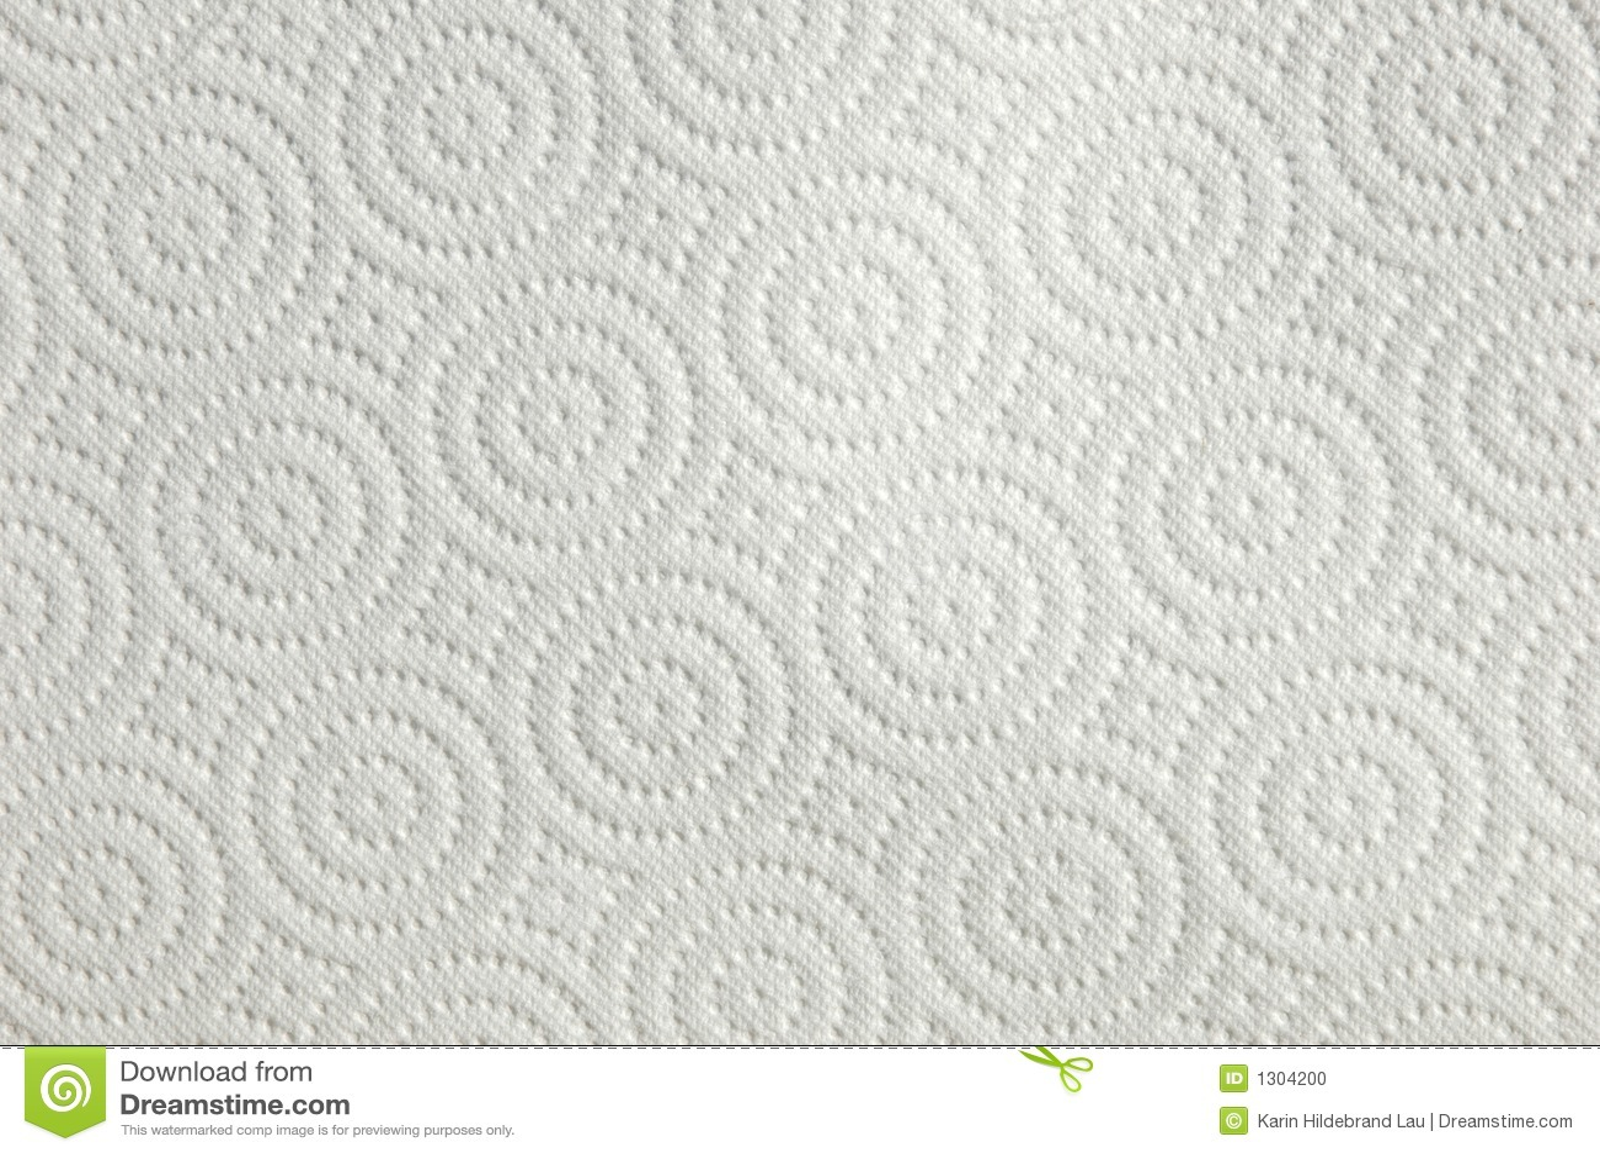 Diagonal Towel Stock Photo